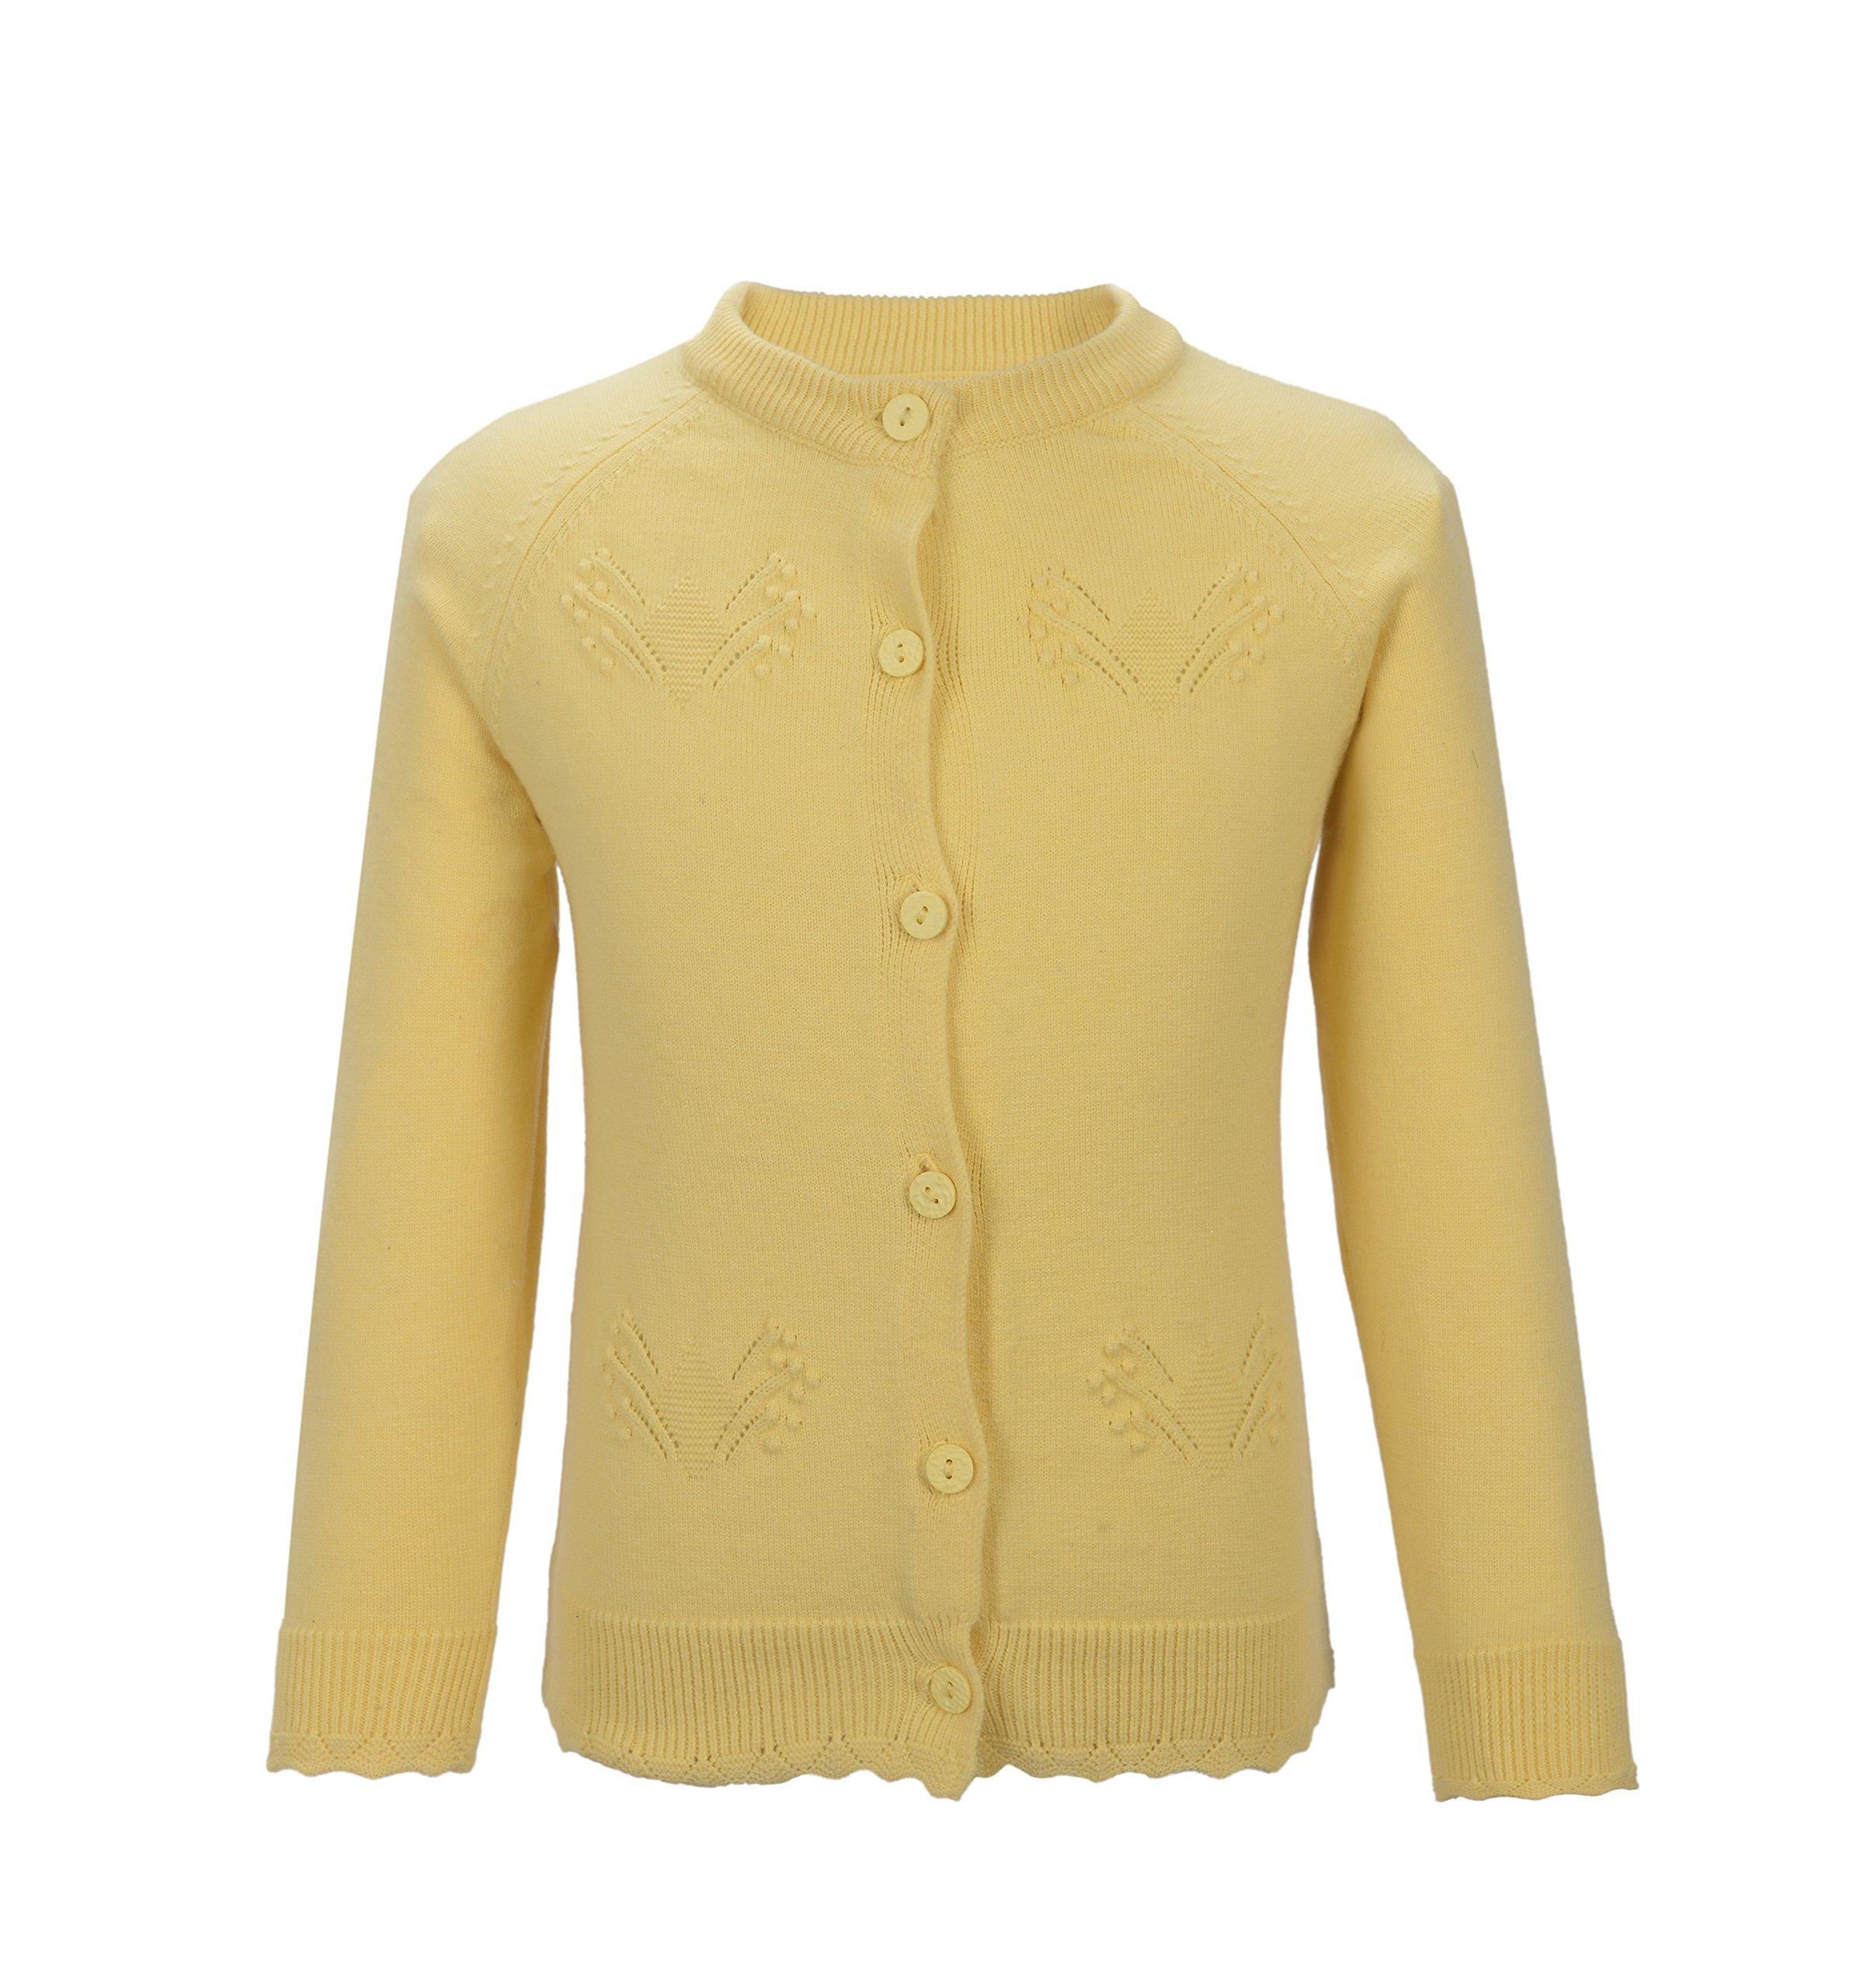 PuTian Kids-Baby Girl Long Sleeve Knitted Cardigan Sweater-Yellow-[5-6Years]